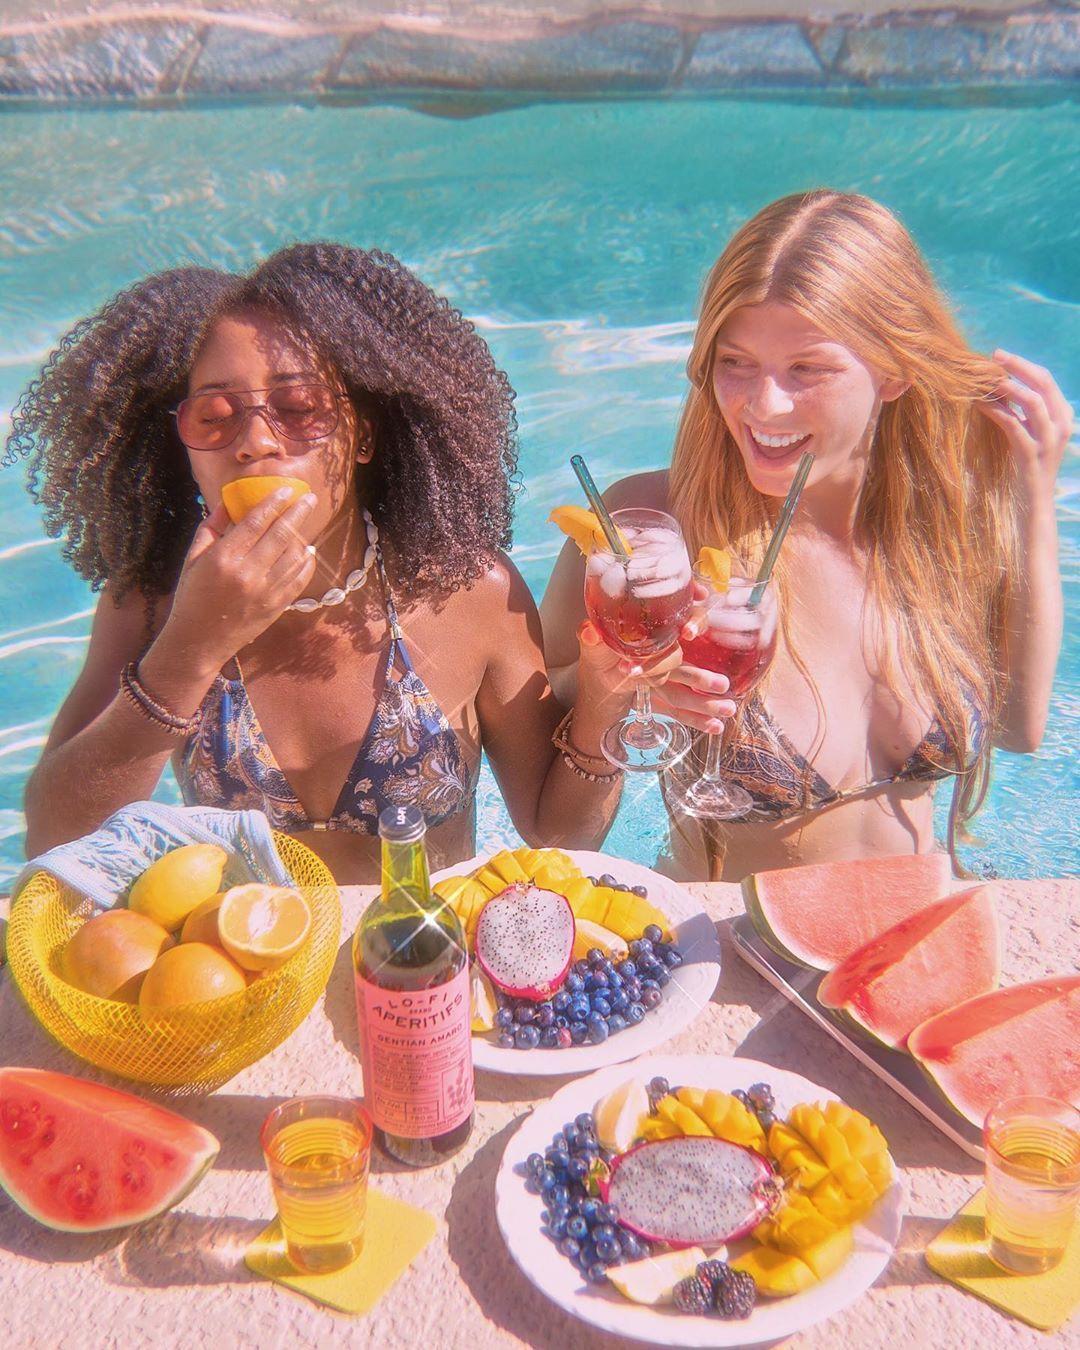 Pin By Lo Fi Aperitifs On West Coast Summer Cute Lesbian Couples